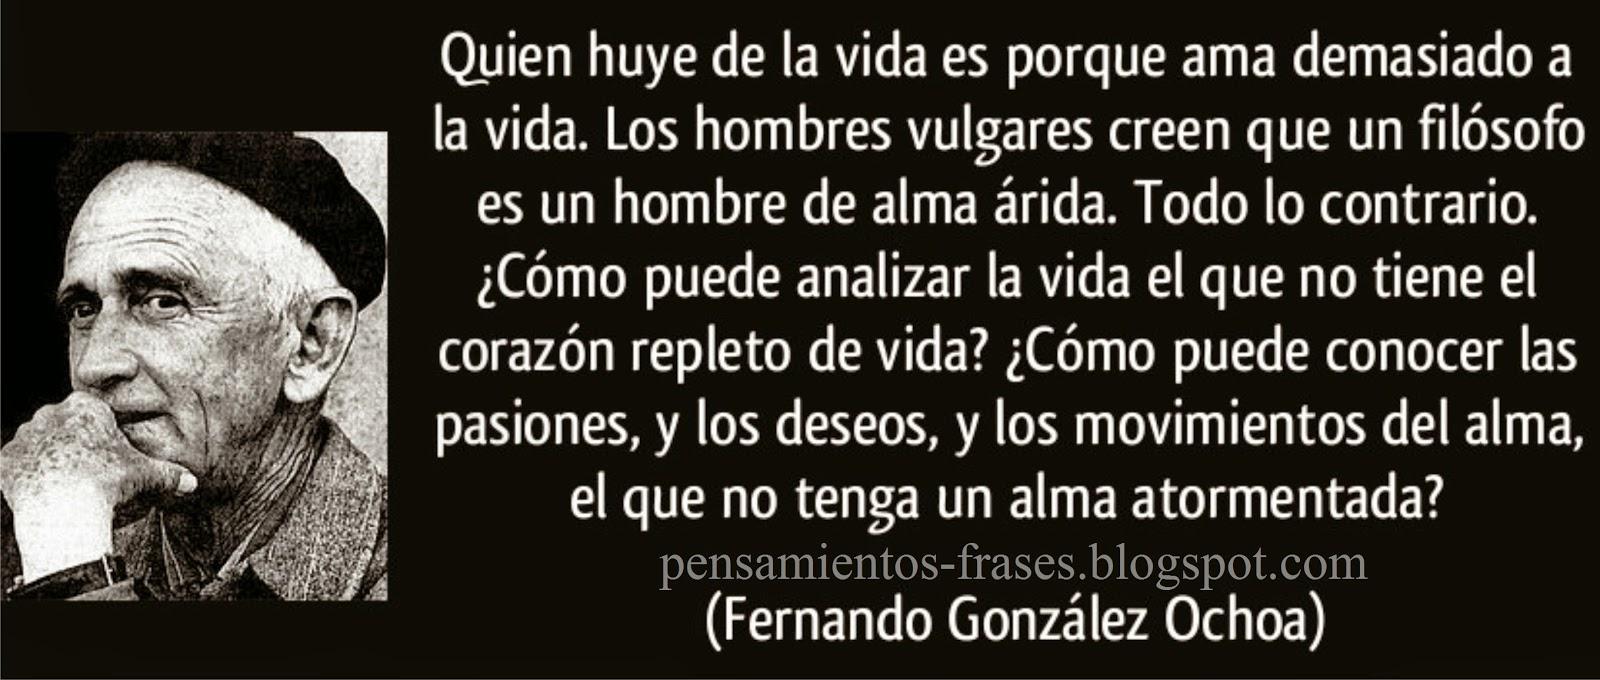 frases de Fernando González Ochoa